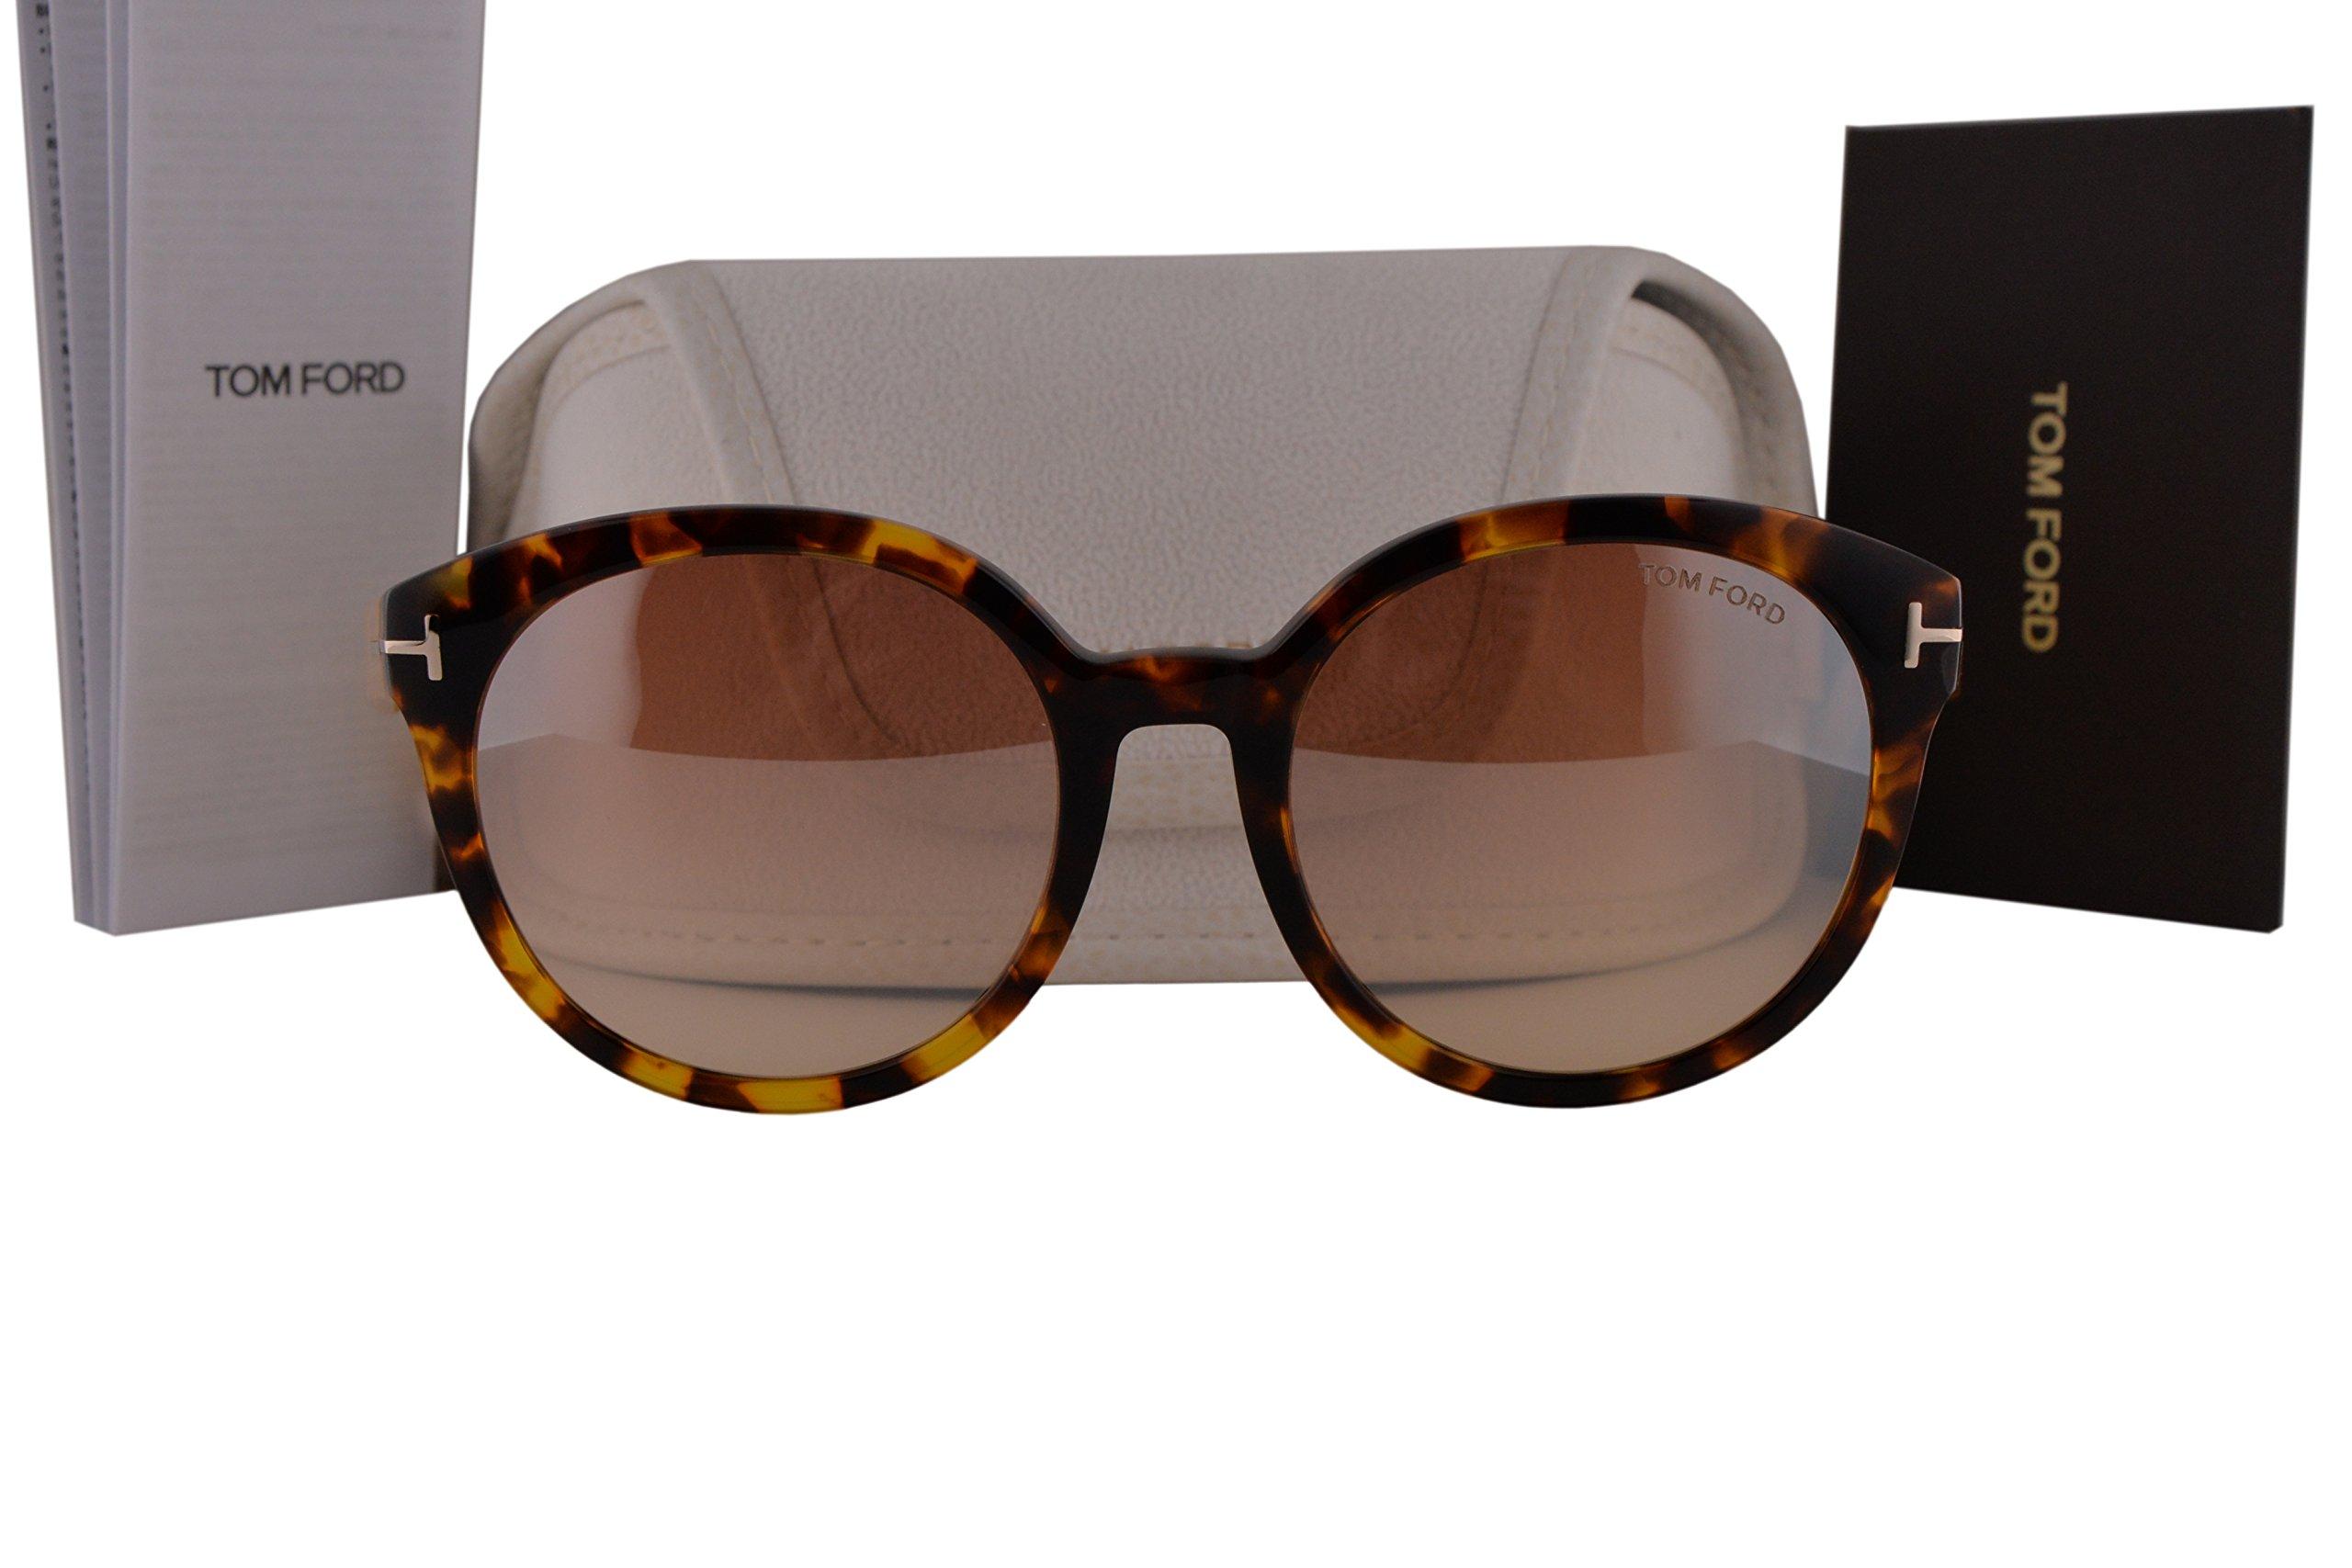 Tom Ford FT0503 Philippa Sunglasses Havana w/Light Brown Gradient Lens 52Z TF503